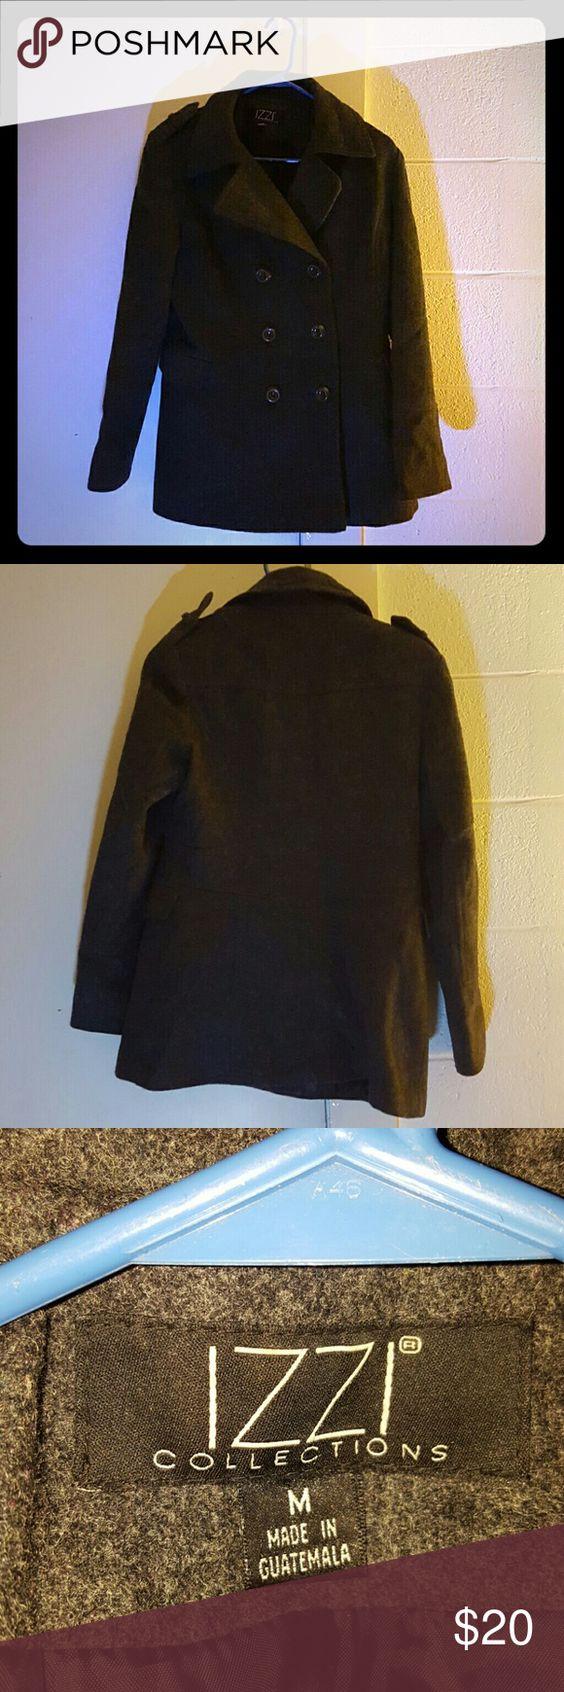 Izzi Collection Women S Pea Coat Great Condition Dark Gray Pea Coat By Izzi Collection And Has No Damages Izzi Collec Pea Coats Women Clothes Design Fashion [ 1692 x 564 Pixel ]